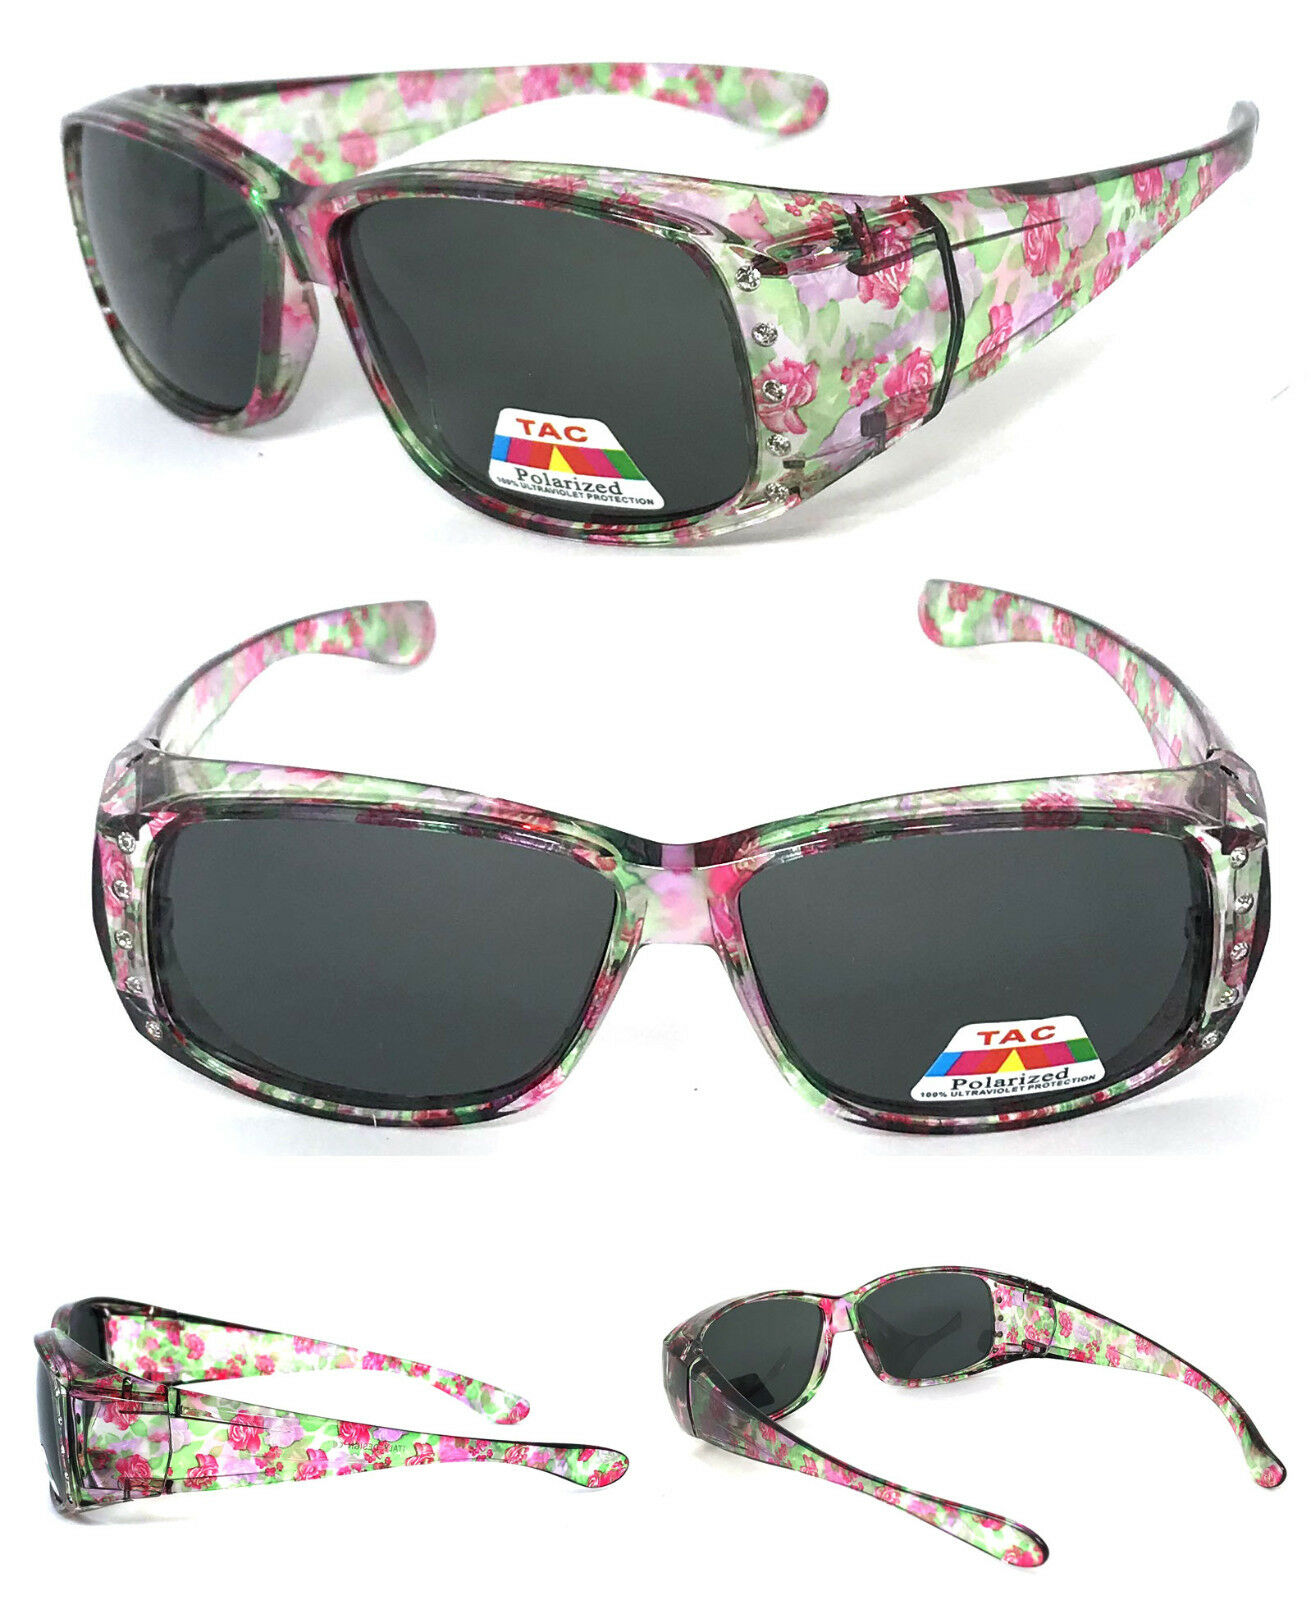 i*sunglasses Fit Over Glasses Mirror 3001CM Grey//Blue-Revo Extra Large XL